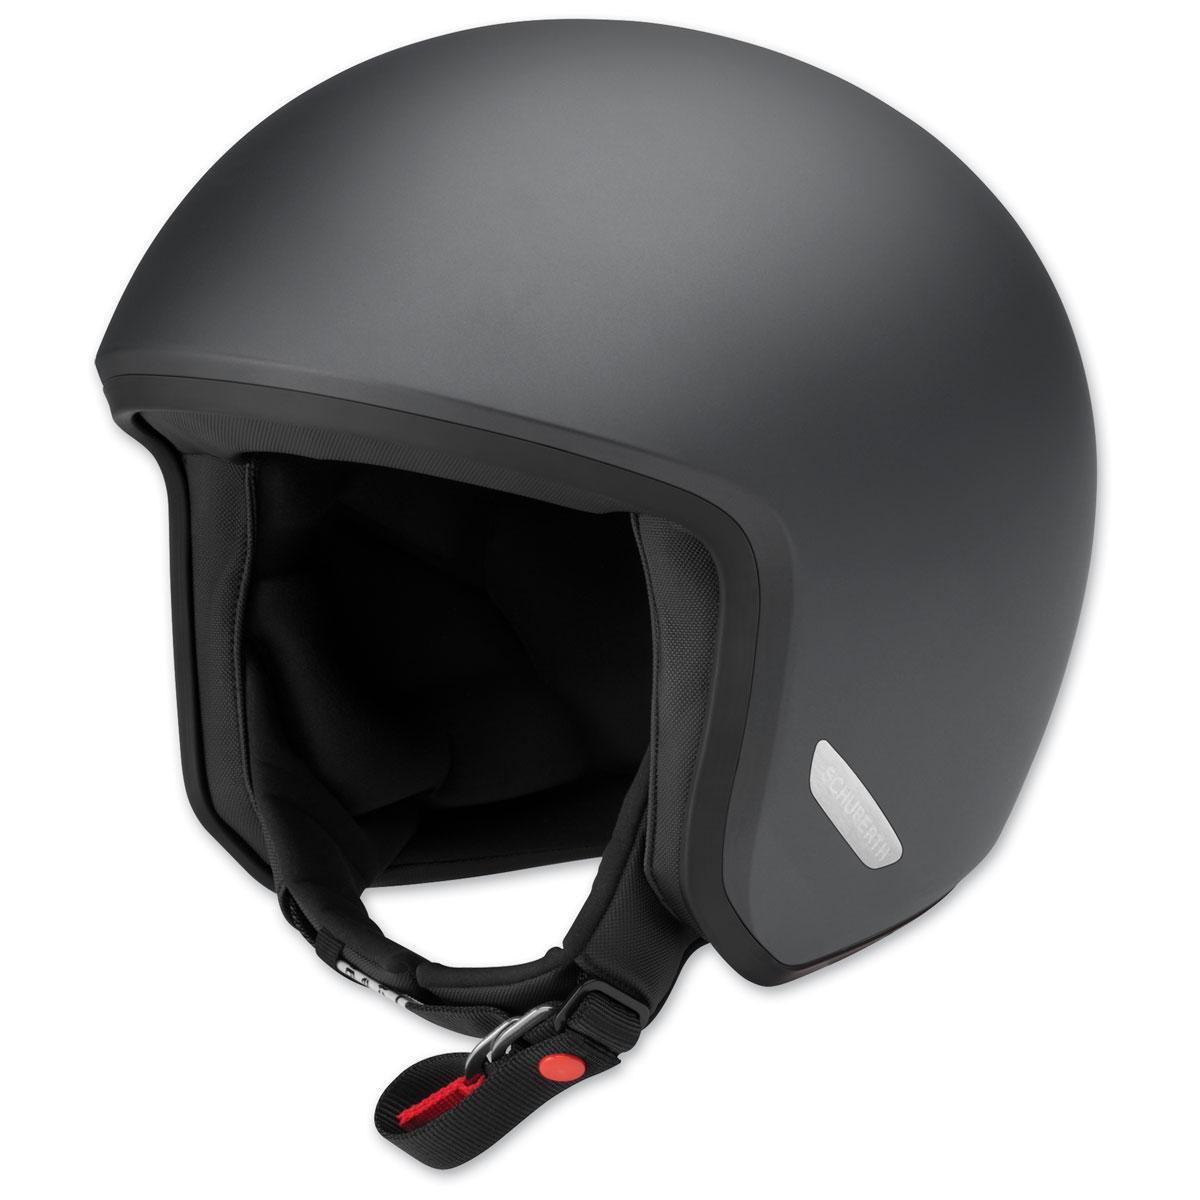 Schuberth O1 Matte Anthracite Open Face Helmet